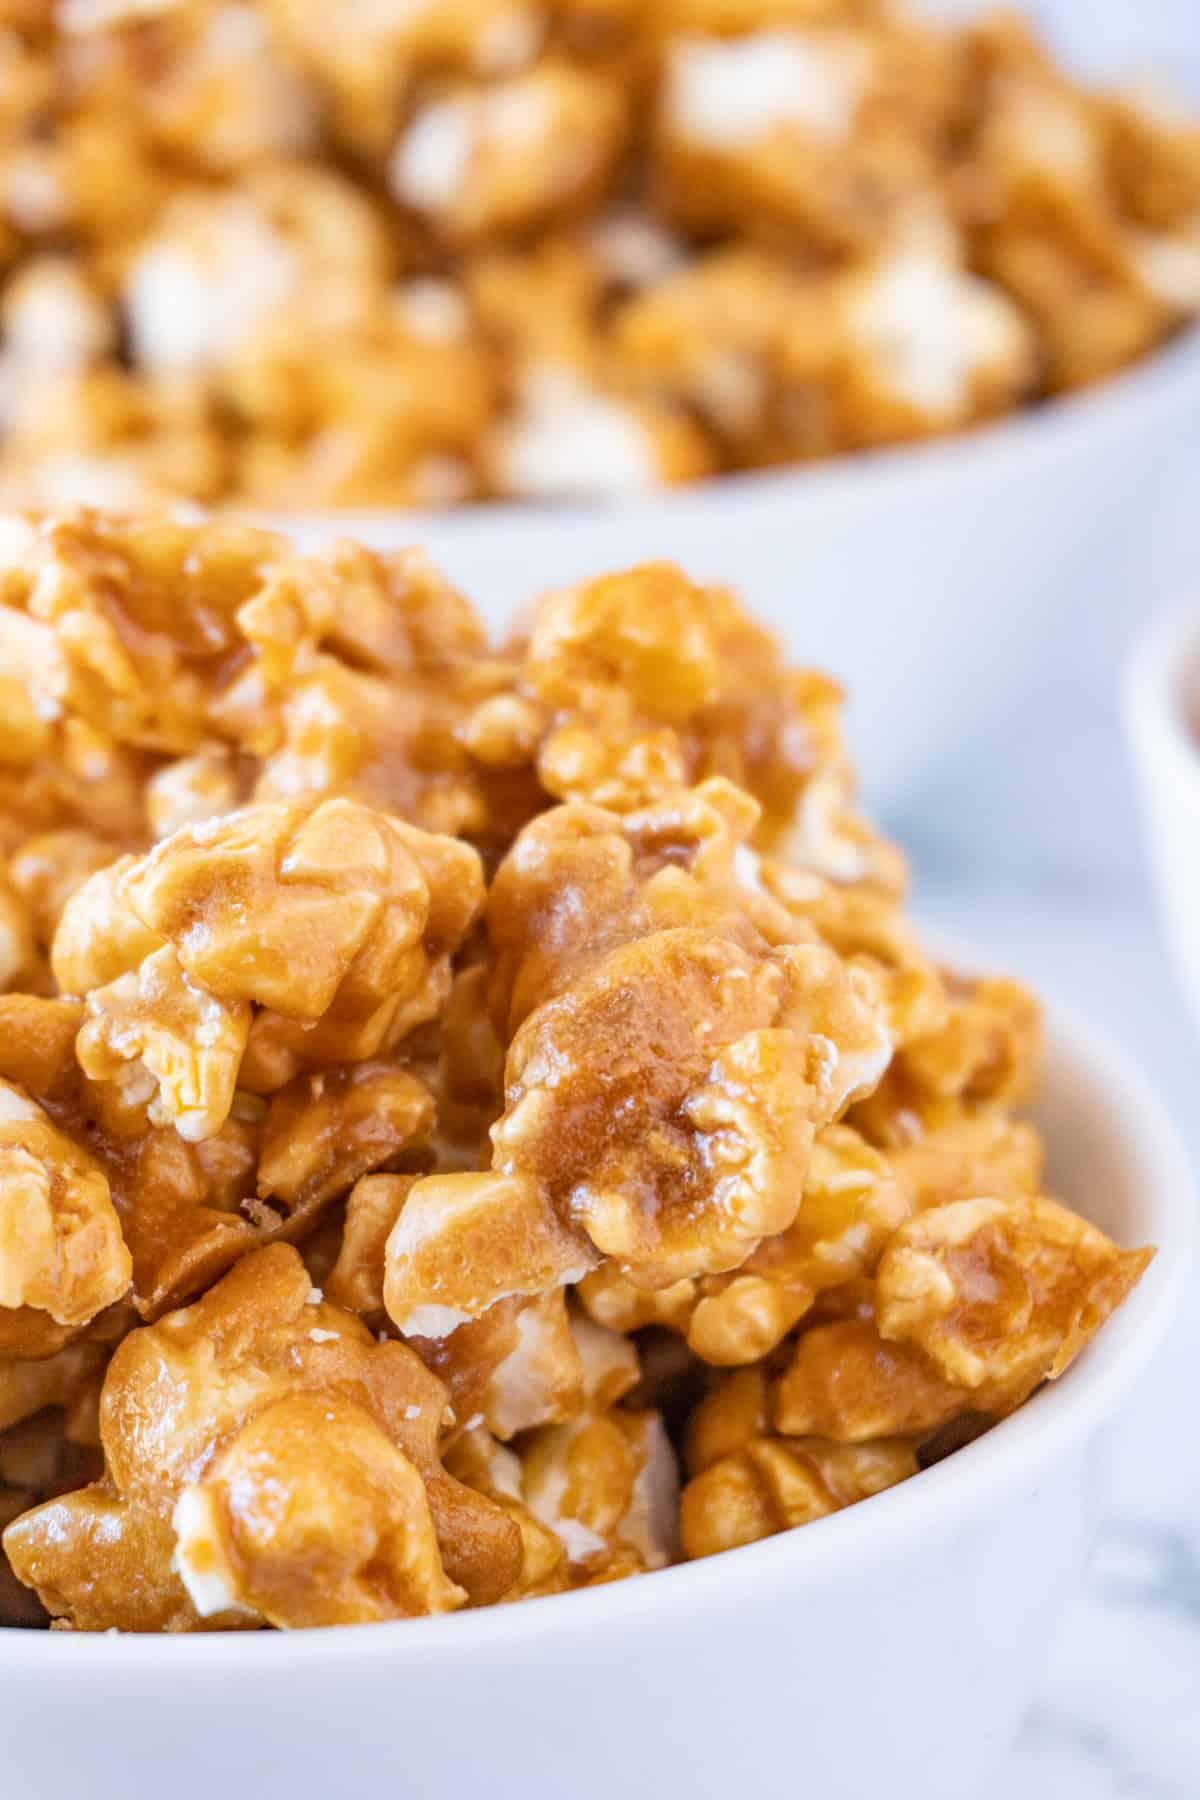 close up of caramel popcorn in bowl